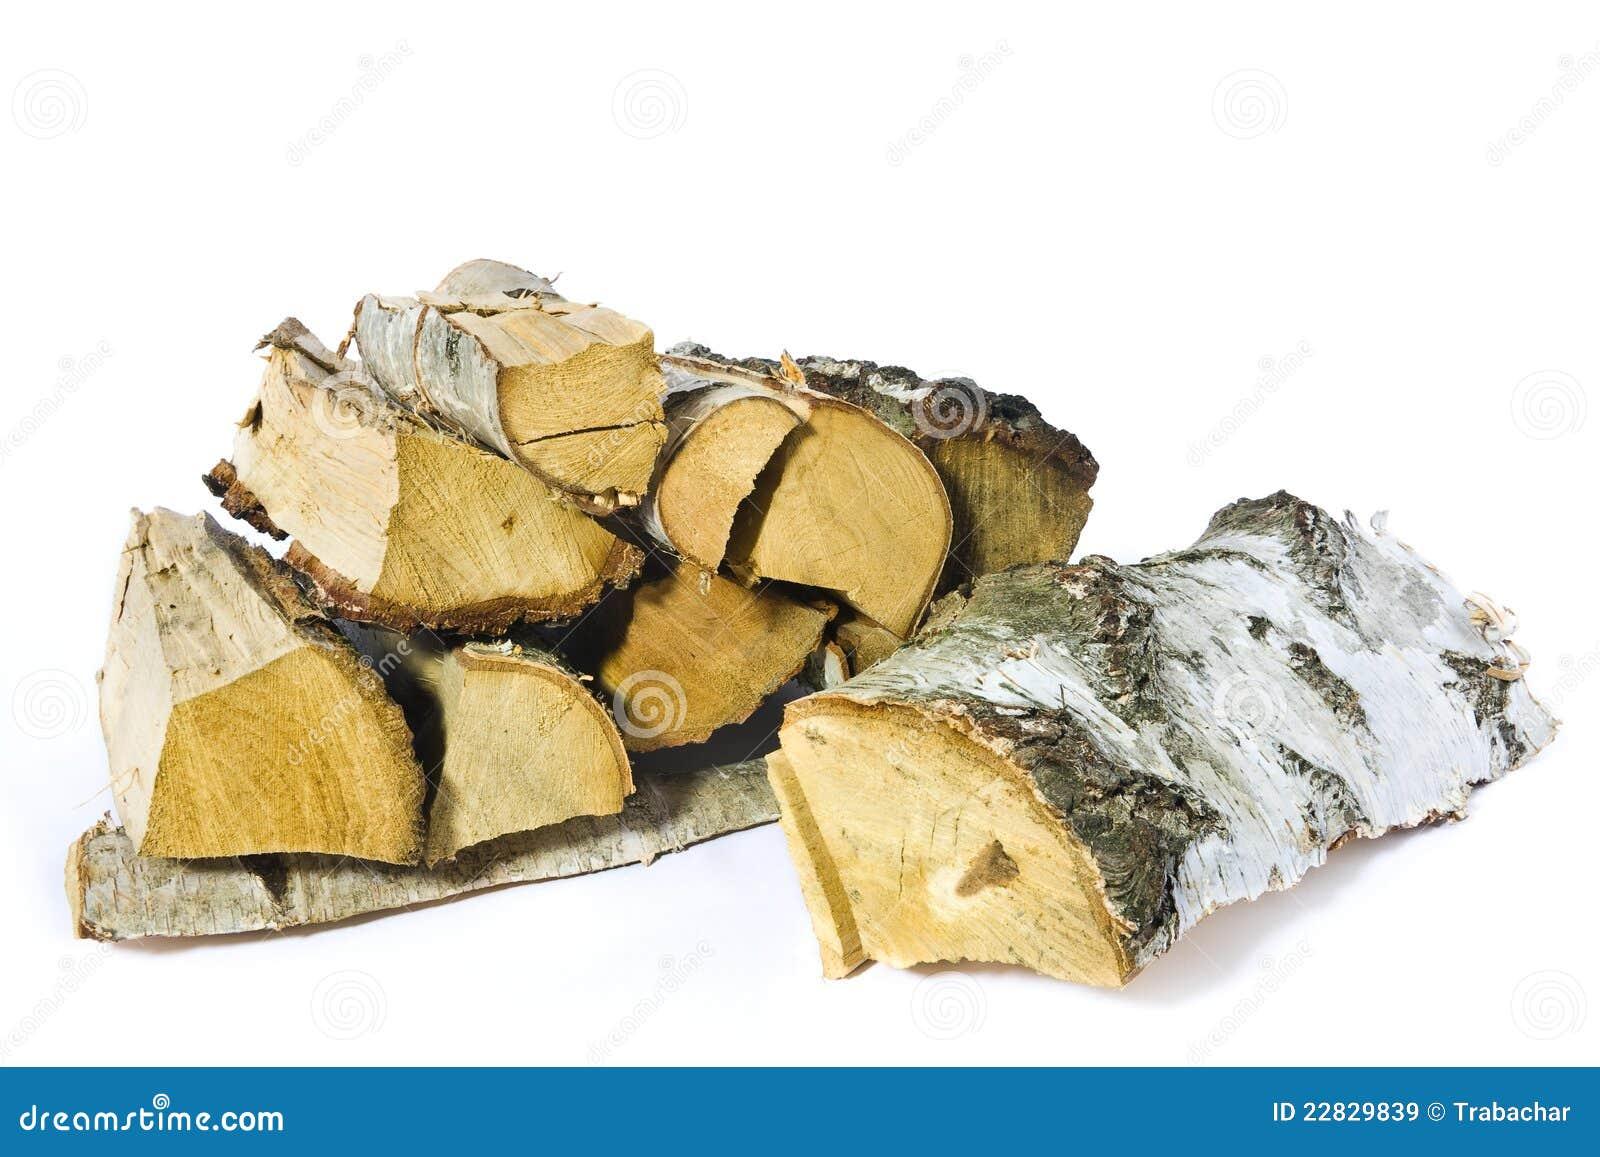 bois de chauffage image stock image du firewood budget 22829839. Black Bedroom Furniture Sets. Home Design Ideas